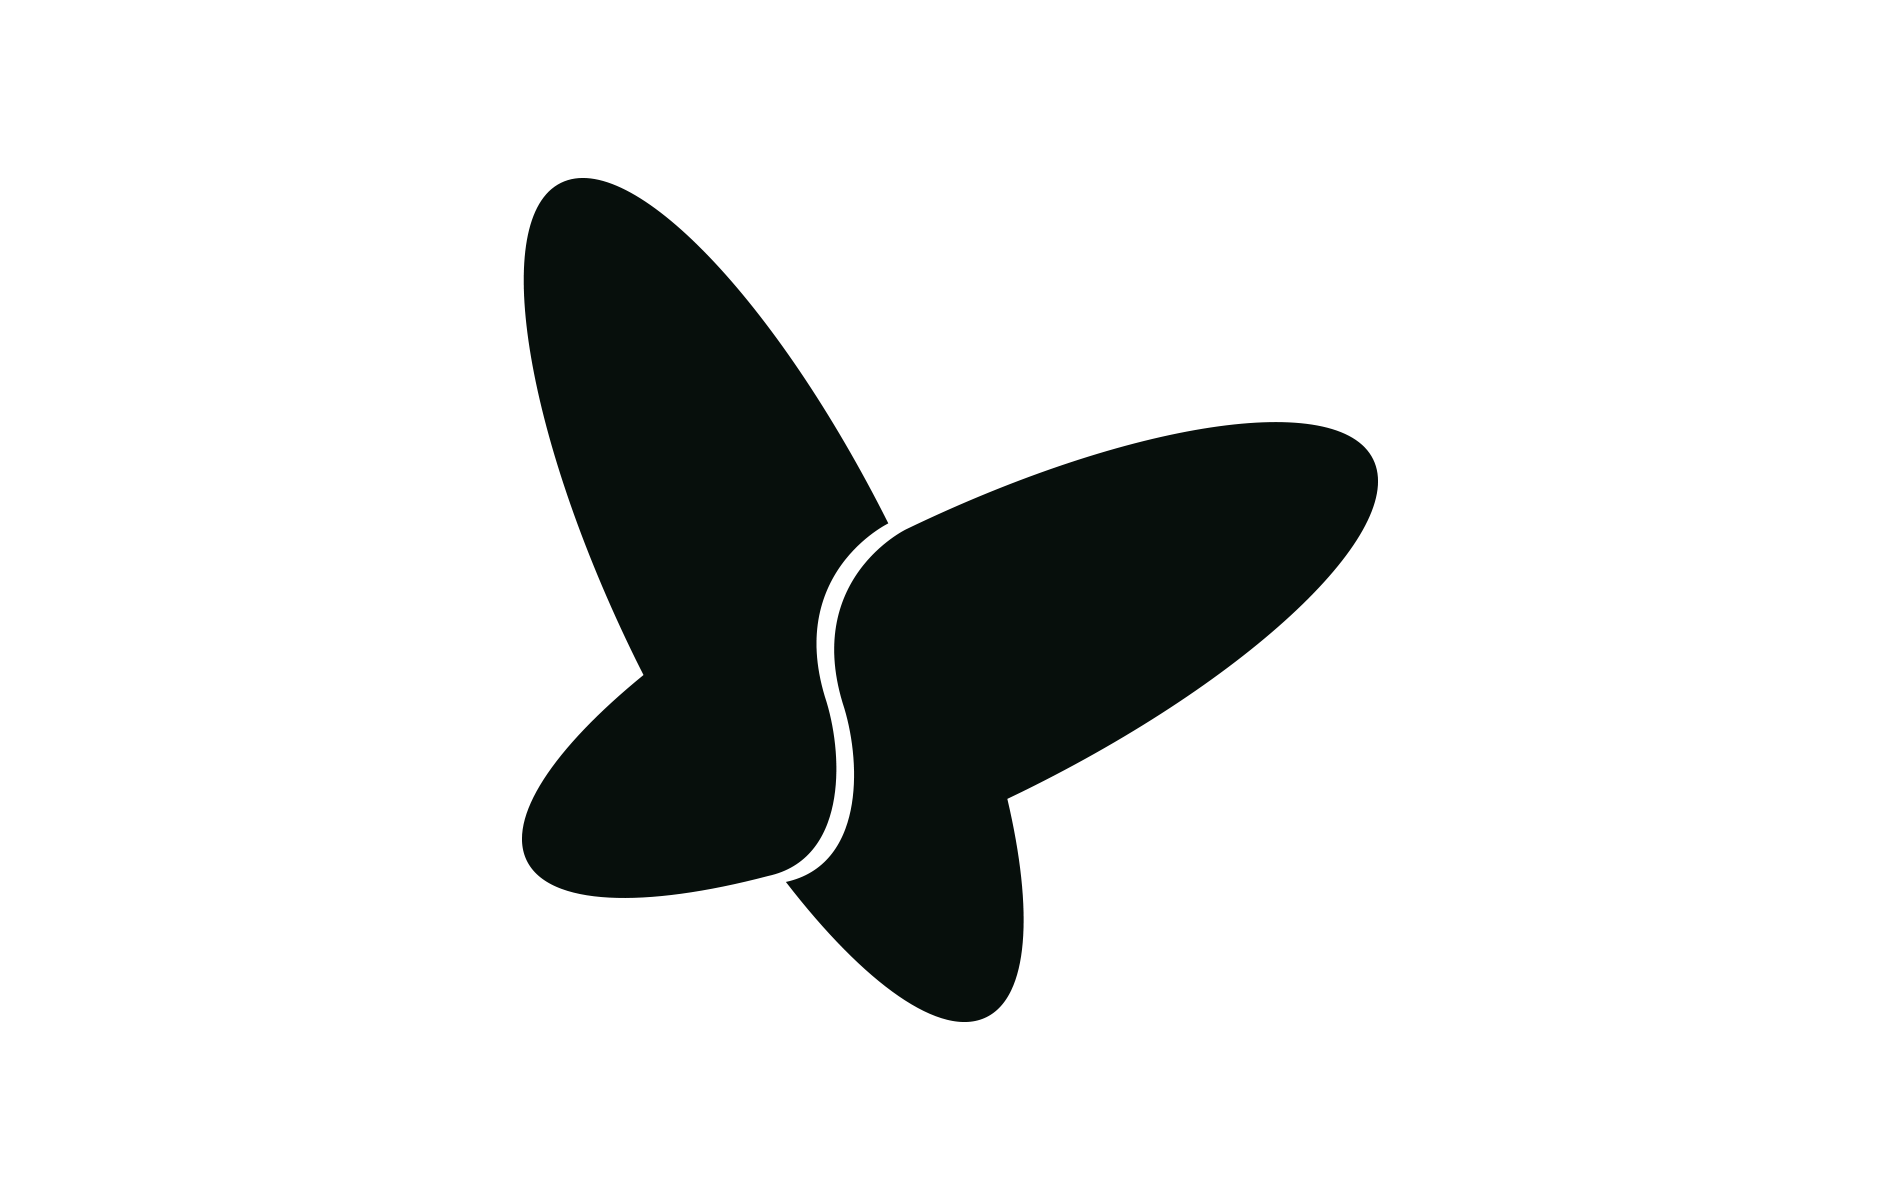 Company - Spineart